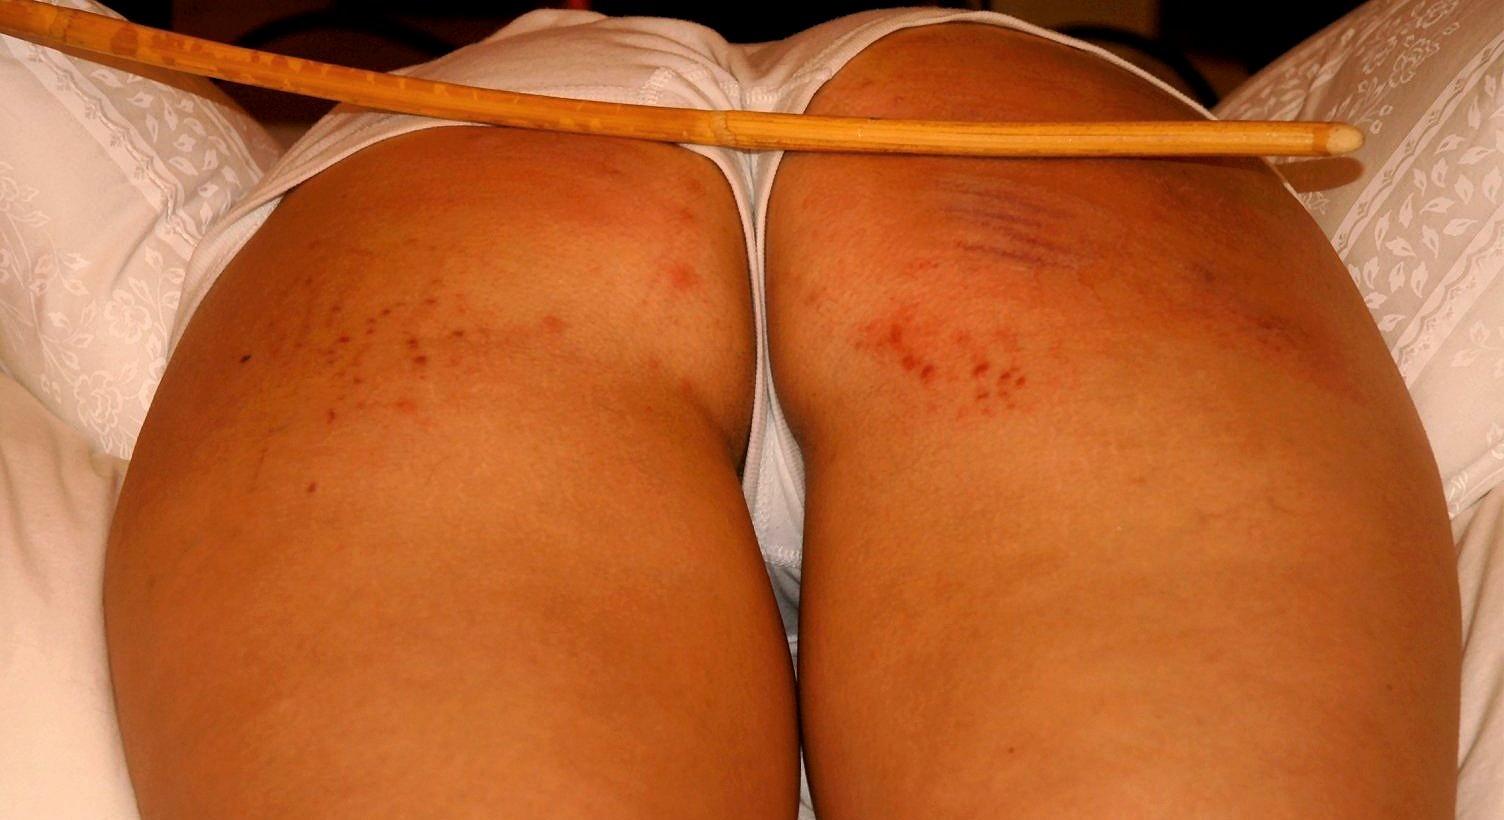 Mature spanking wife hard wet cock amateur vagina squriting